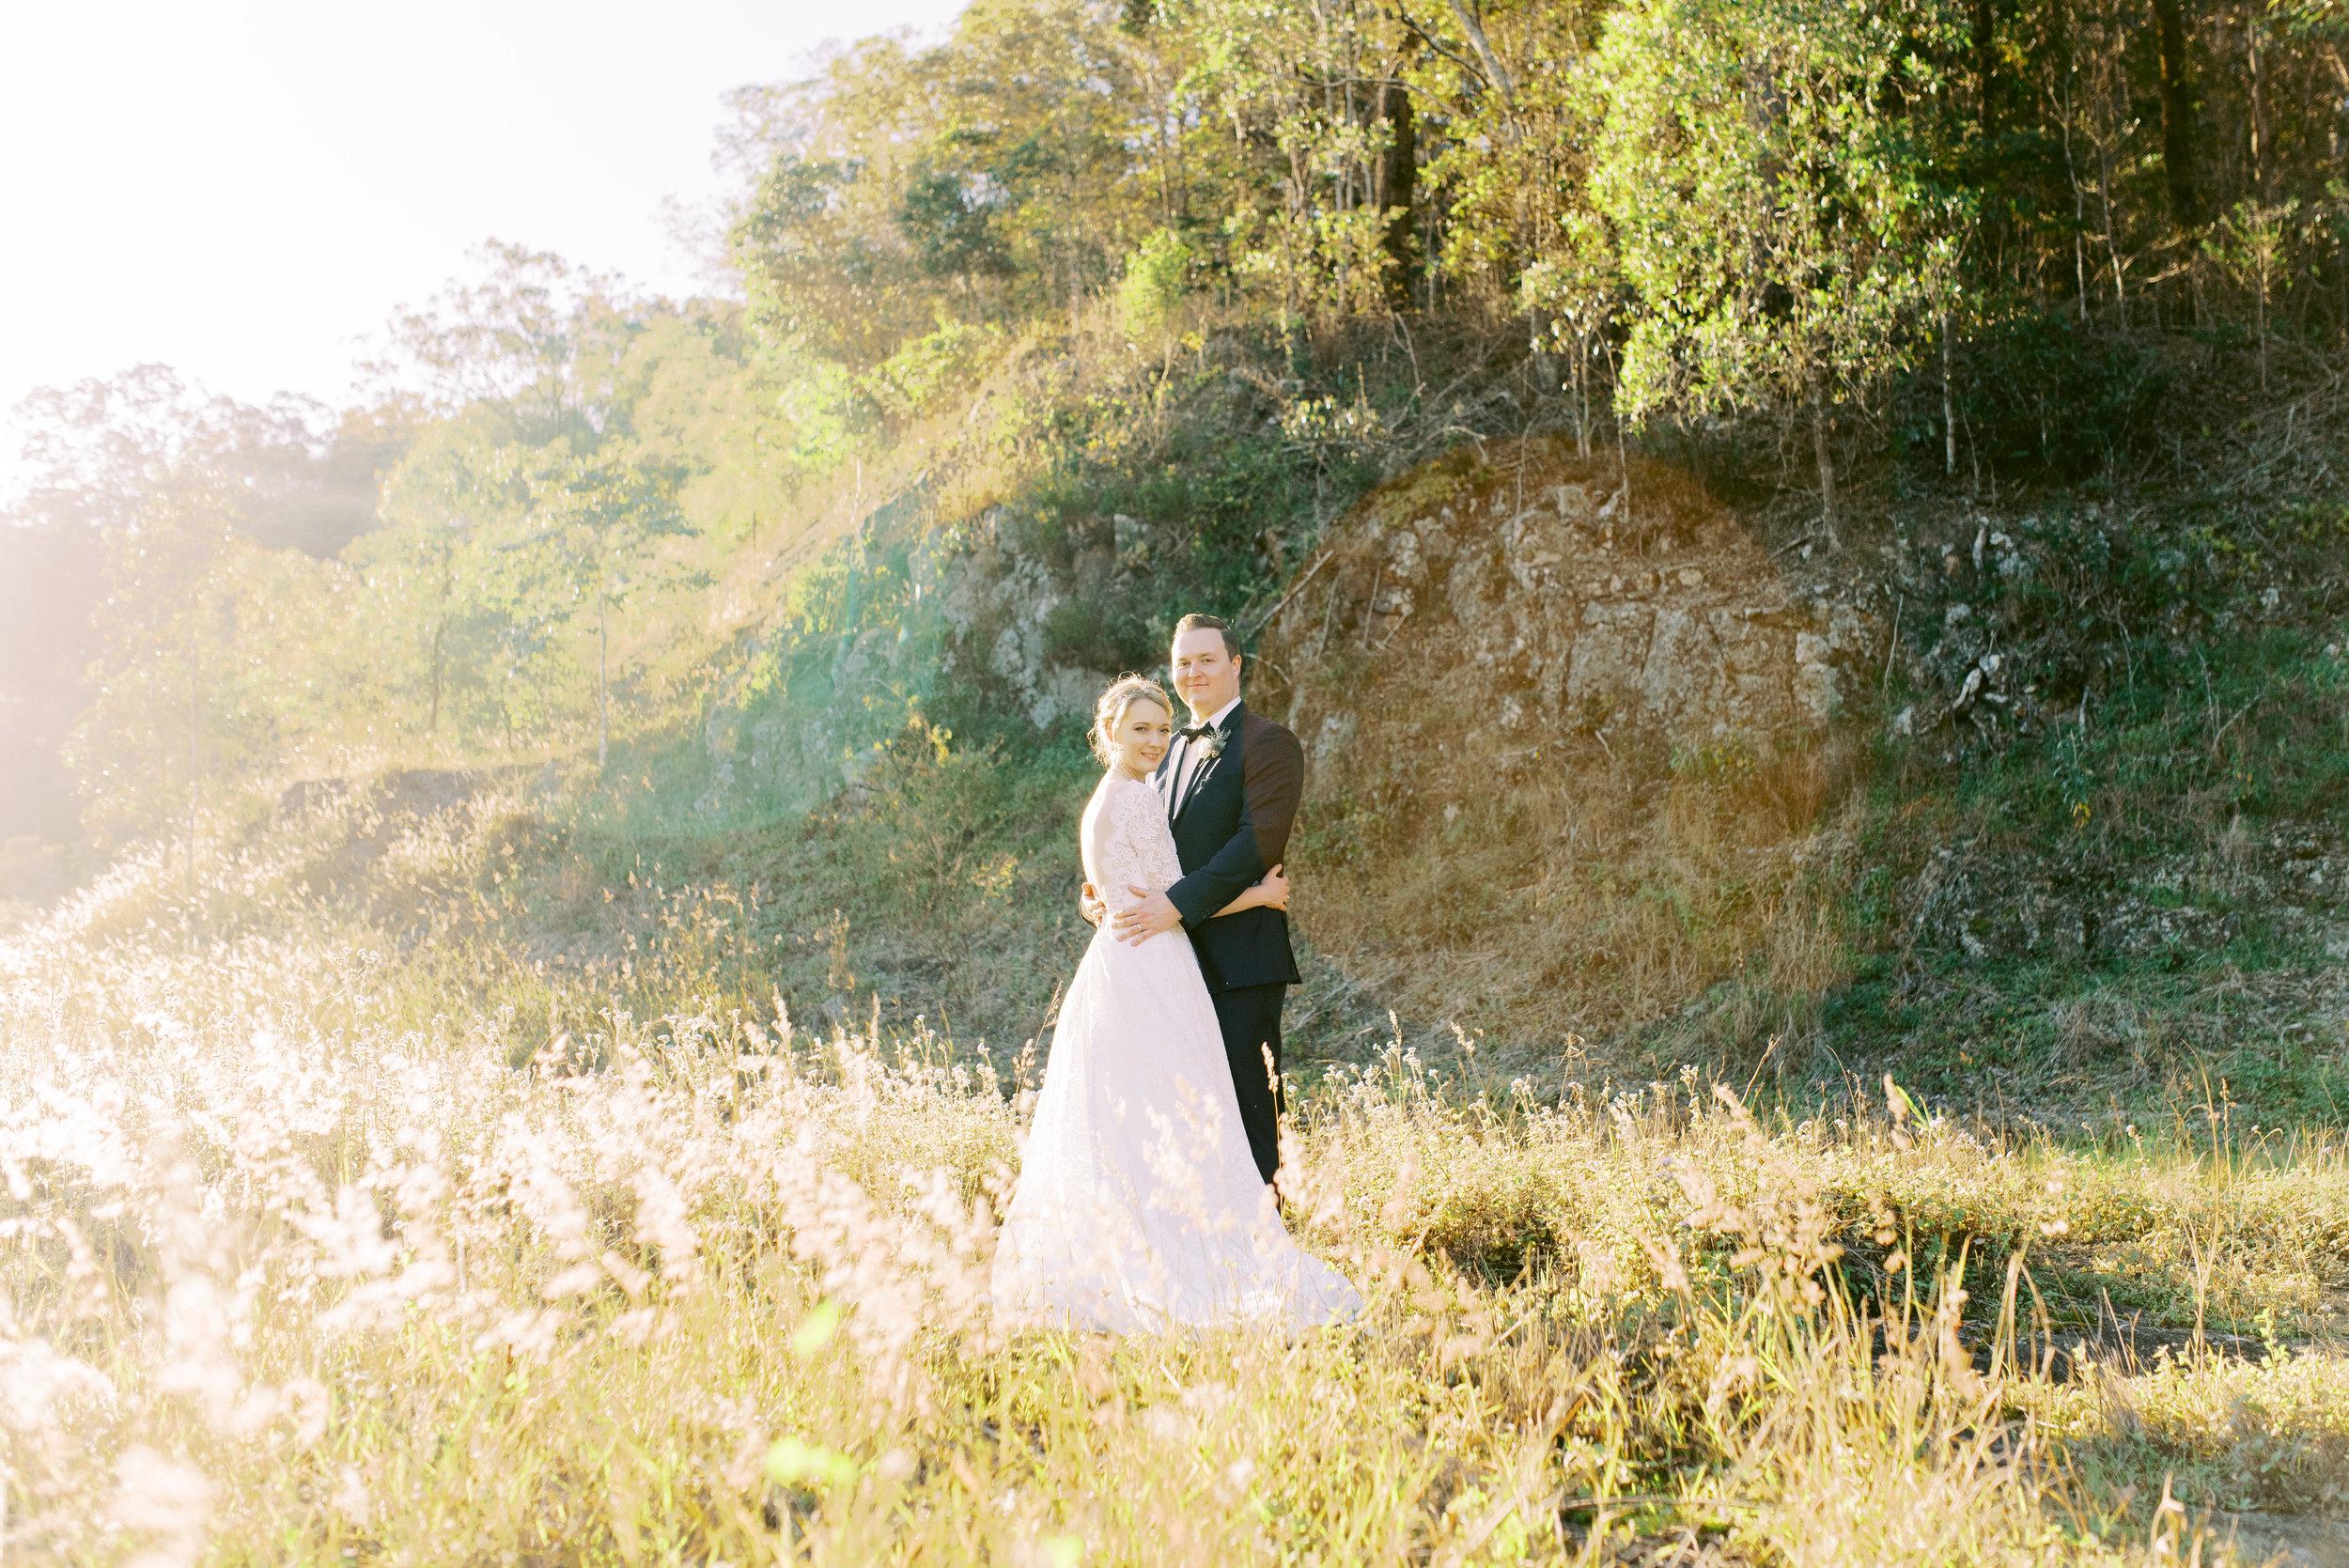 brisbane-gold-coast-sunshine-coast-tweed-romantic-fine-art-wedding-photography-lauren-olivia-45.jpg